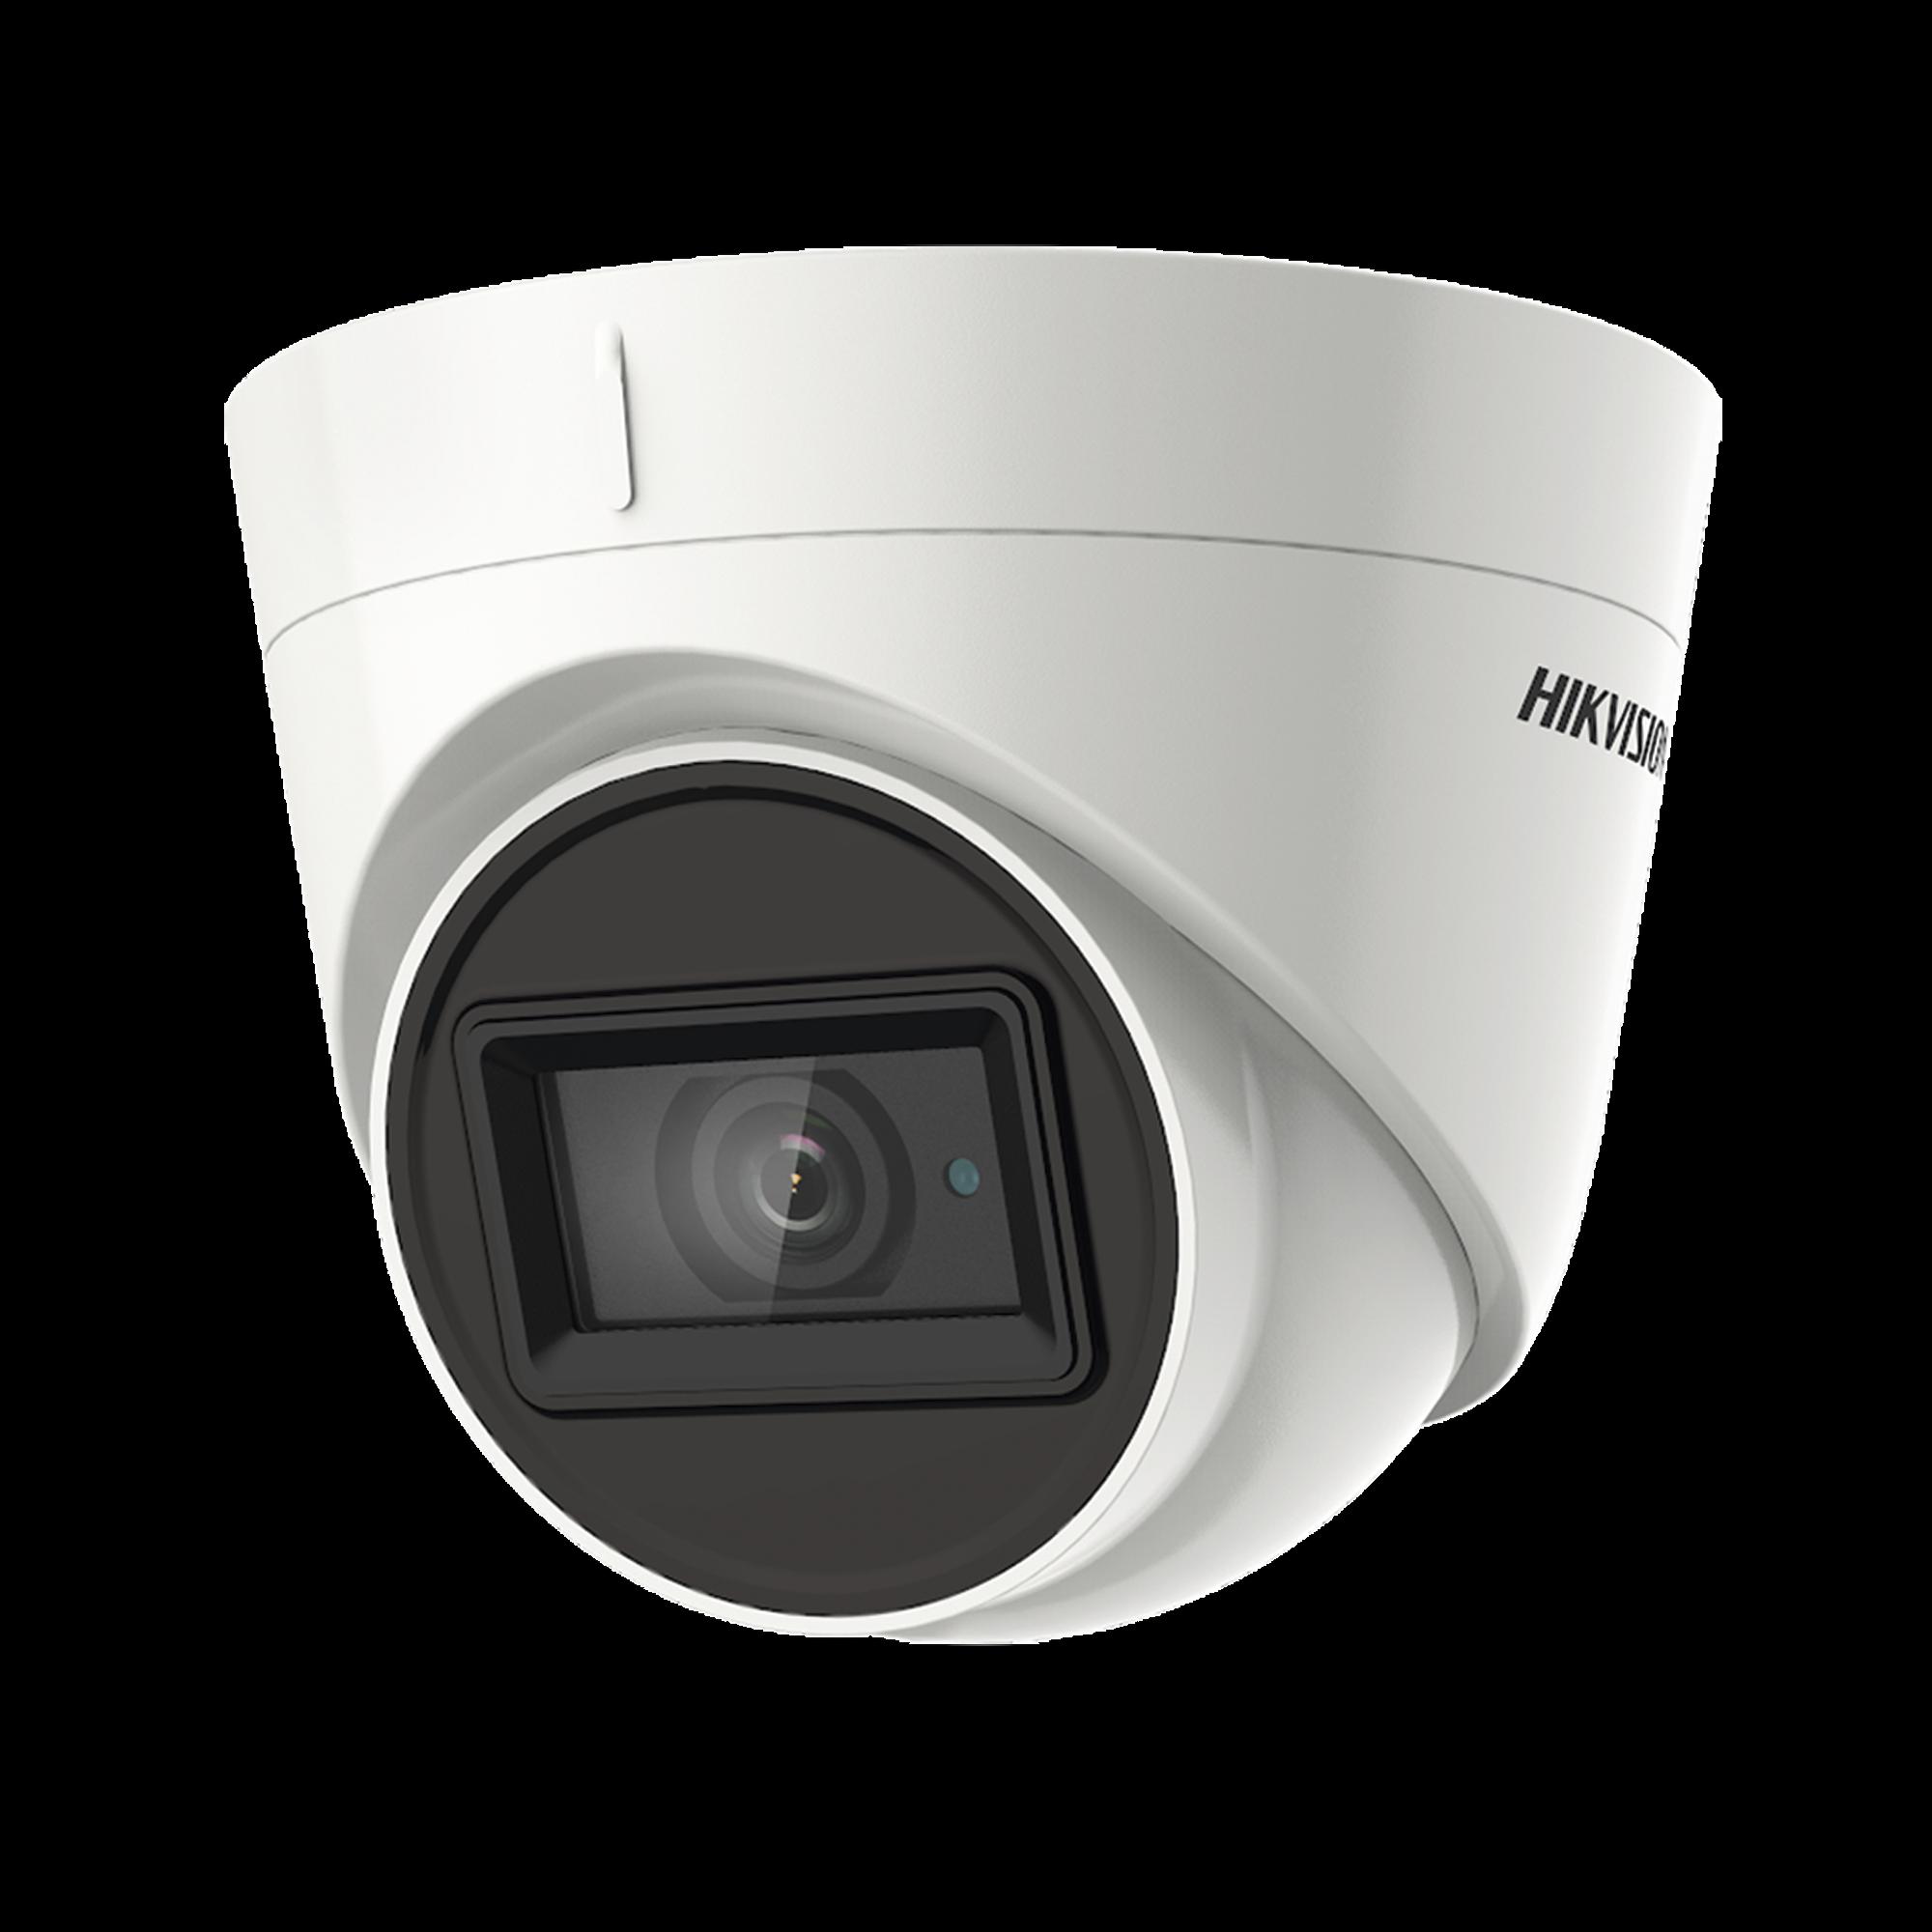 Eyeball TURBOHD 4K (8Megapixeles) / Gran Angular 102? / Lente 2.8 mm / Exterior IP67 / IR EXIR de 60 mts / TVI-AHD-CVI-CVBS / dWDR